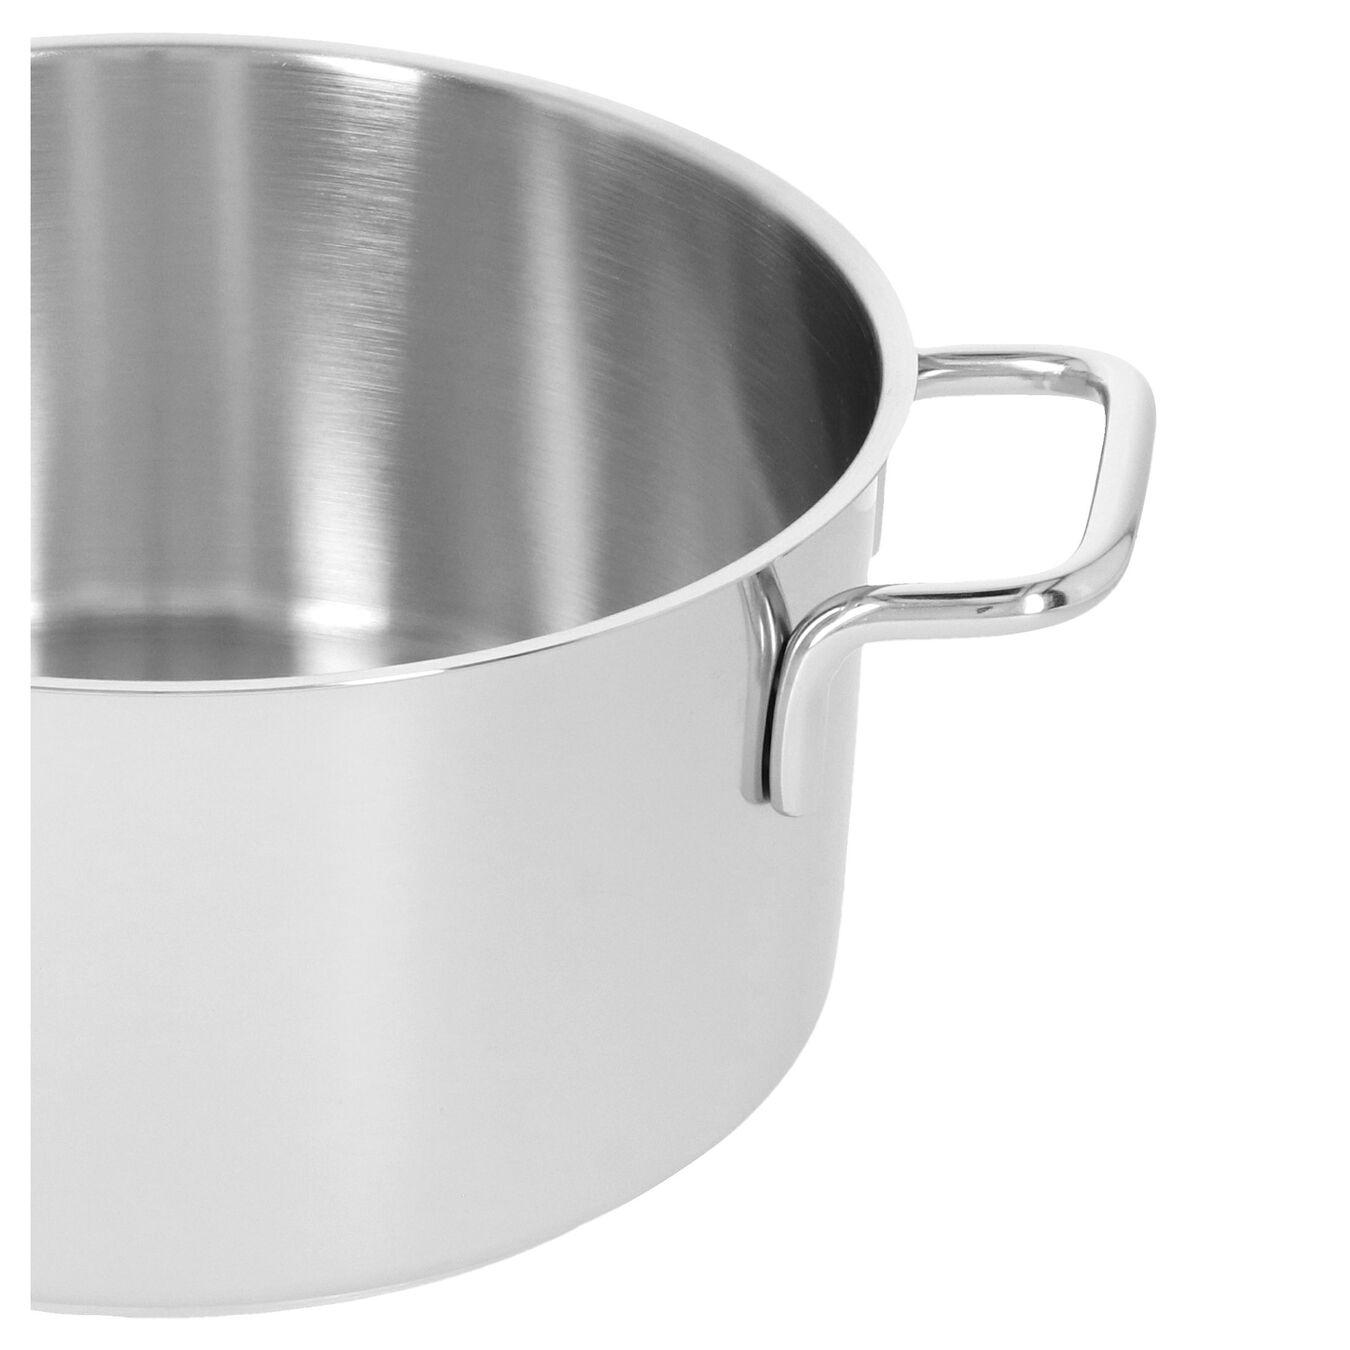 Kookpot met deksel 20 cm / 3 l,,large 3